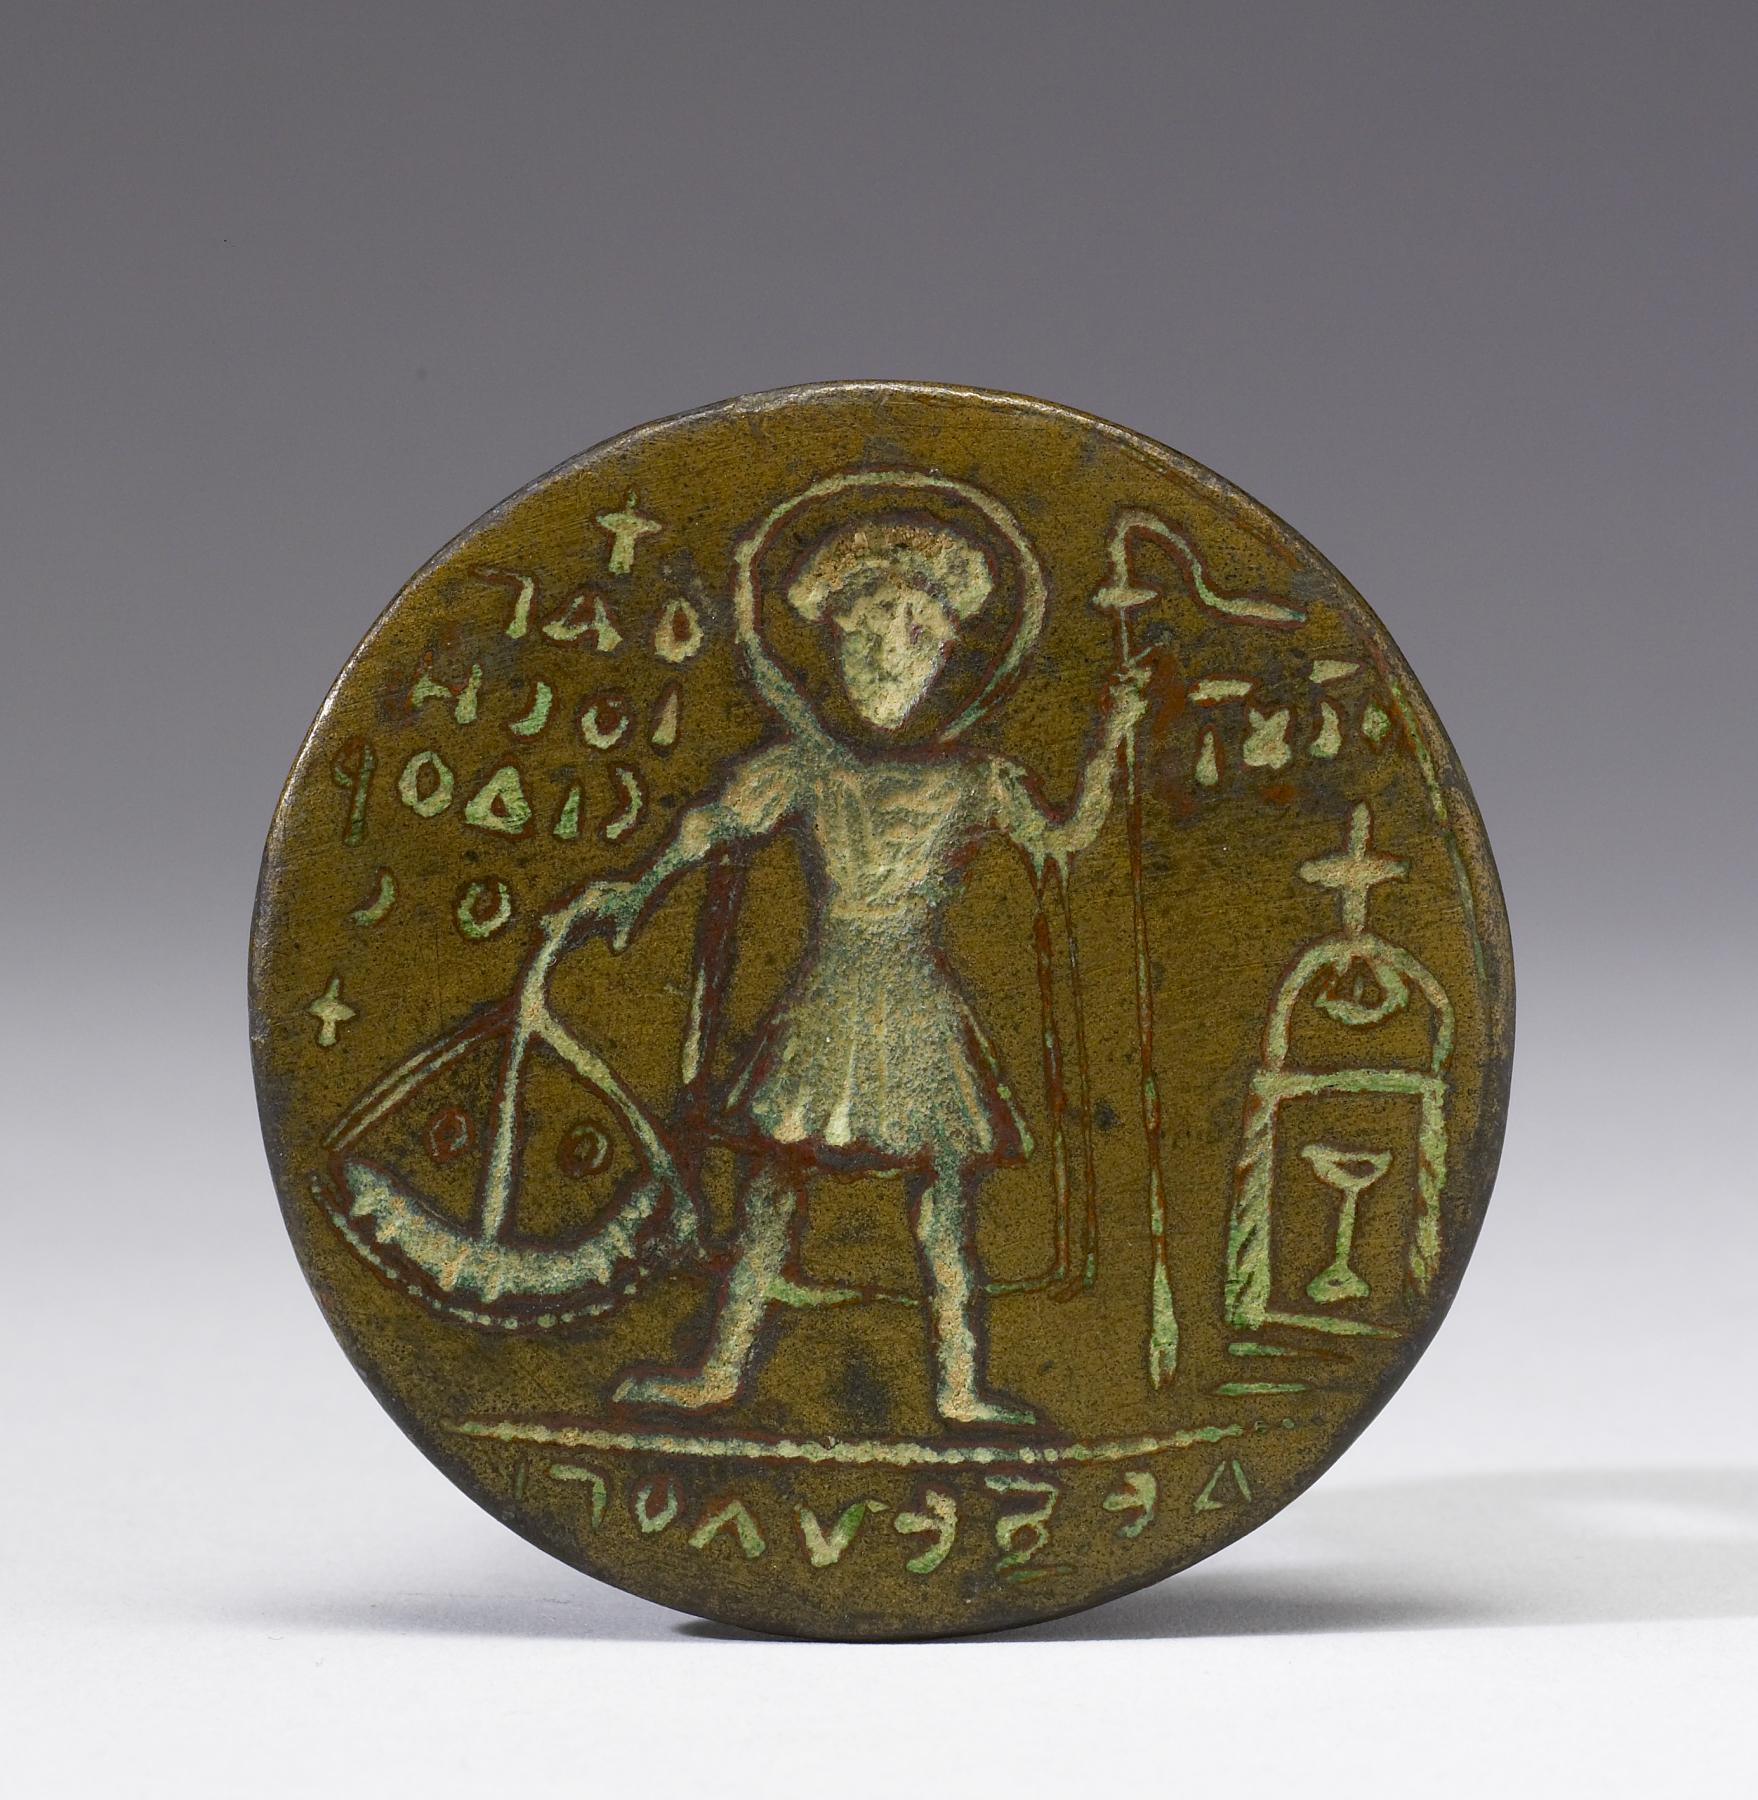 Den hellige Isidor, bysantinsk pilegrimsstempel i messing (500-t), The Walters Art Museum i Baltimore i Maryland i USA